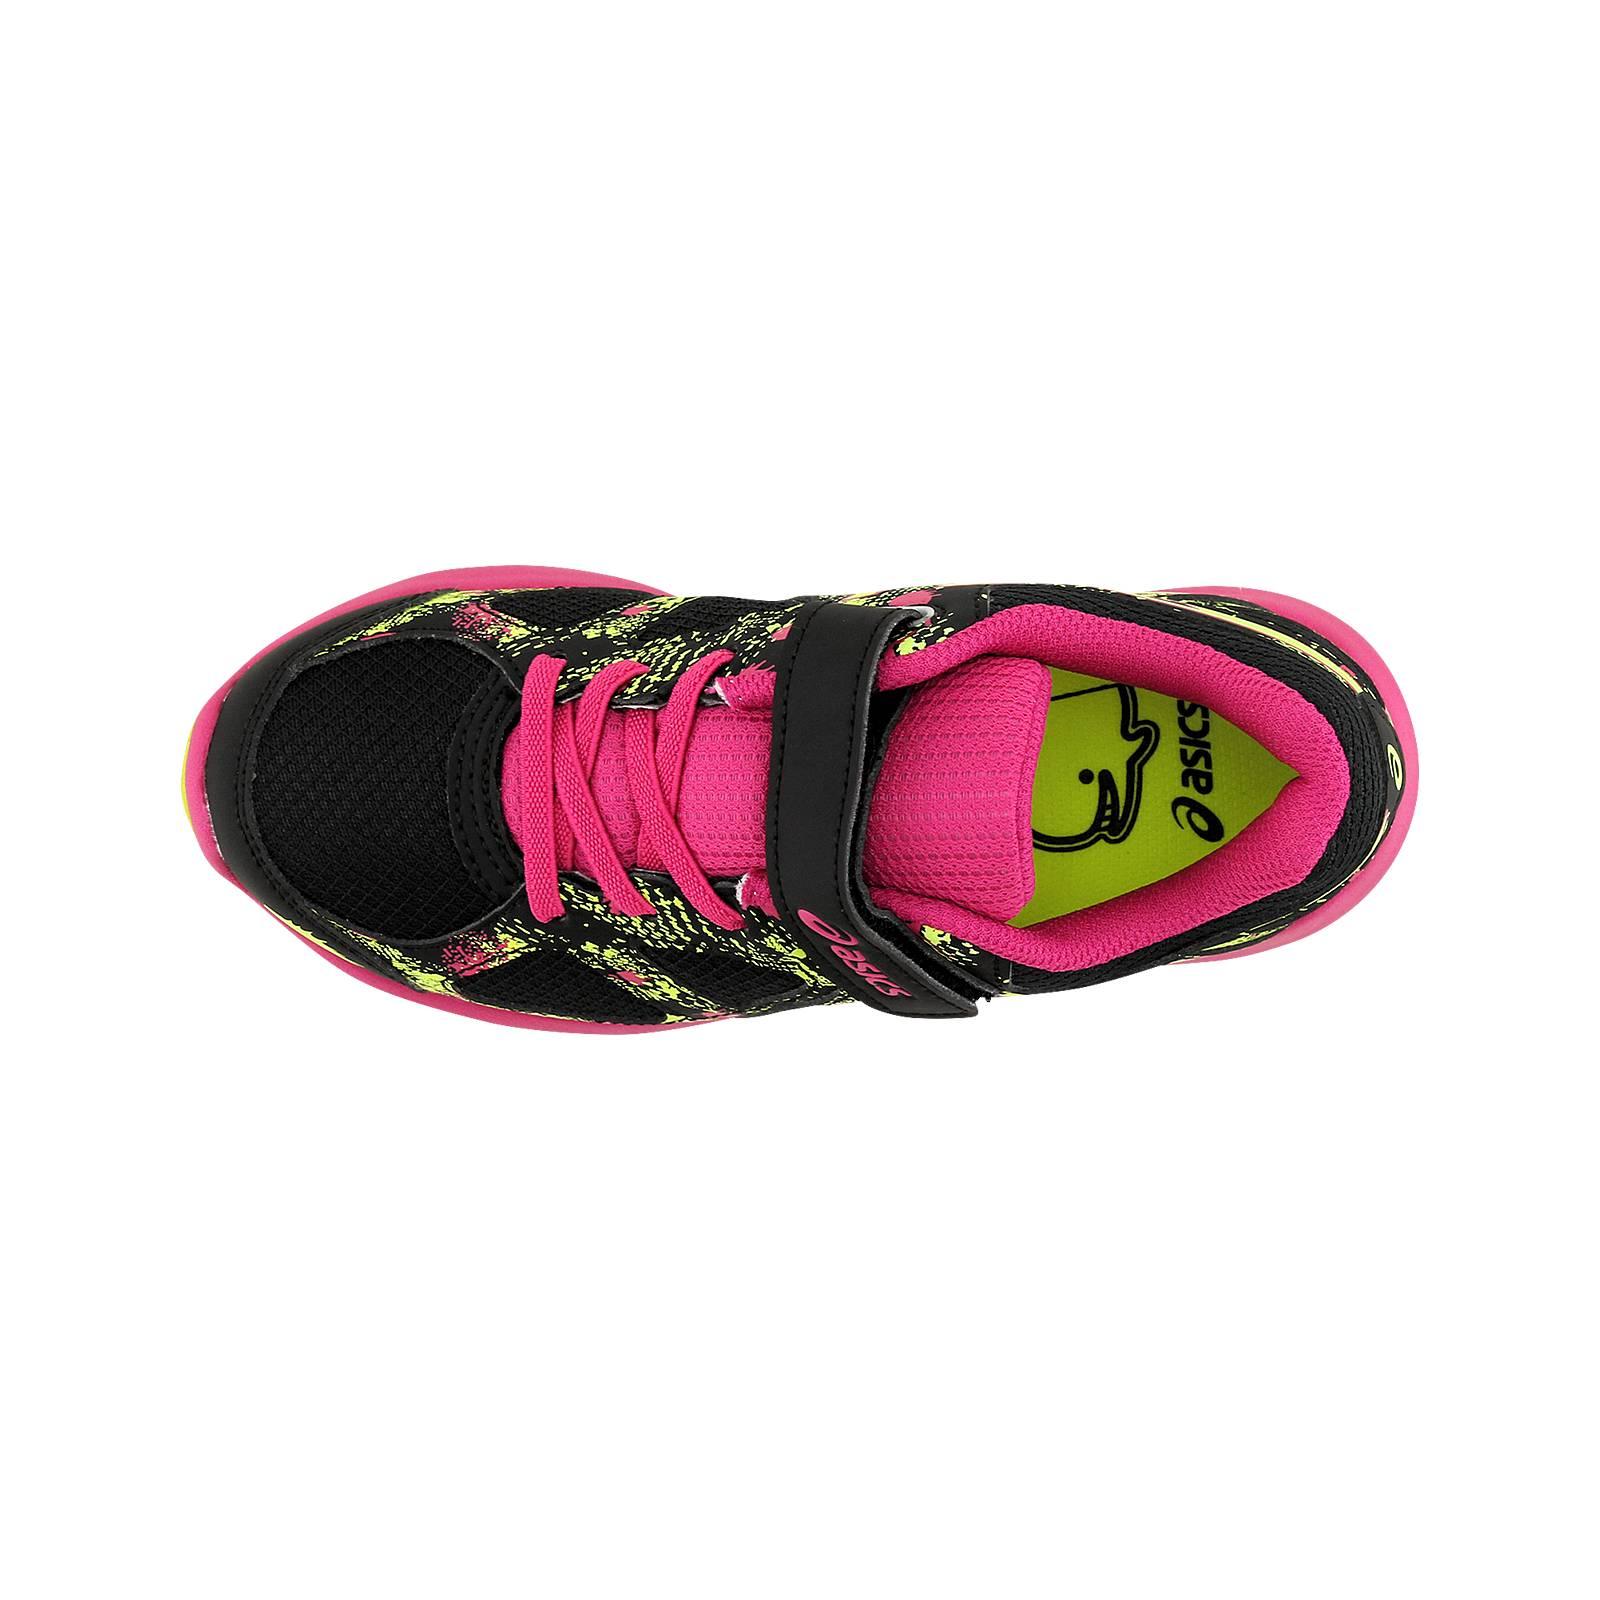 Gel-Lightplay 3 PS - Παιδικά αθλητικά παπούτσια Asics από υφασμα και ... 0eda409fd35